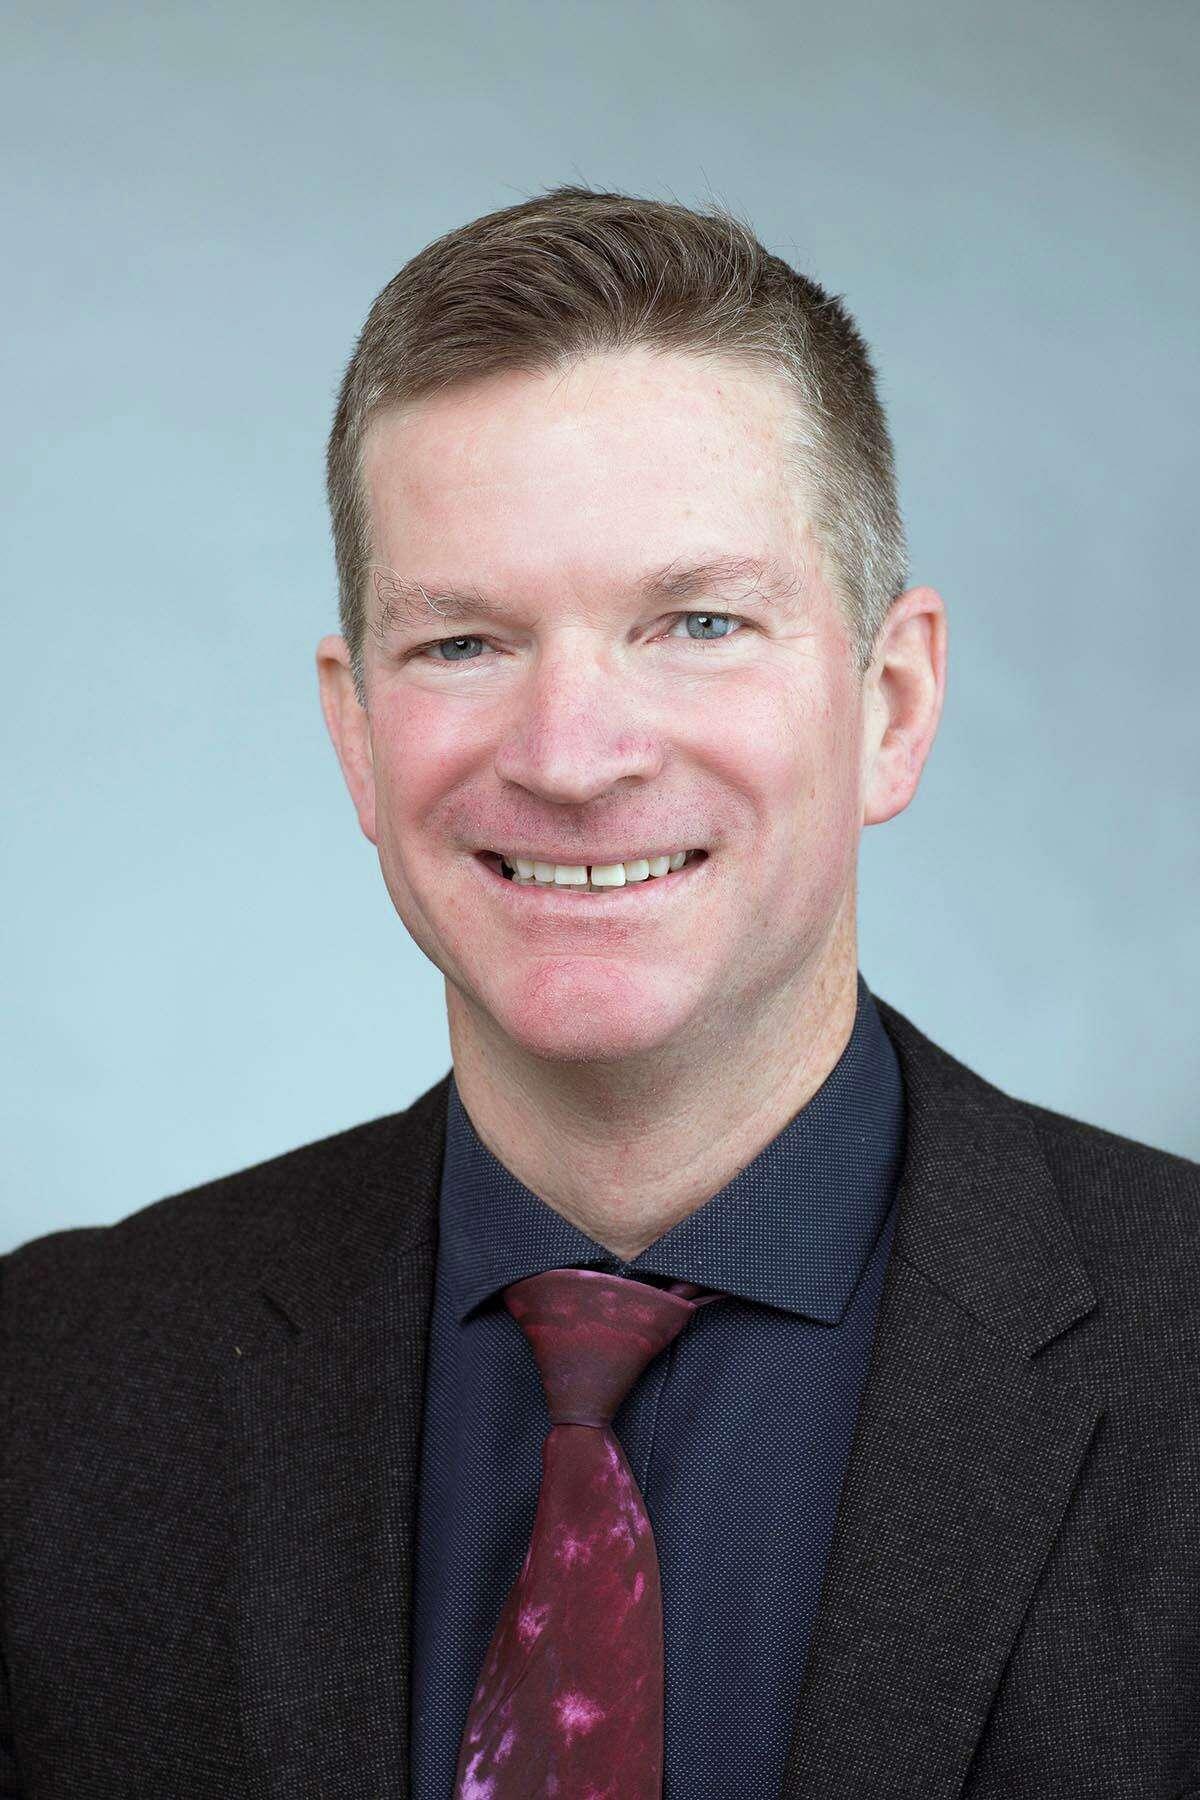 Sean Duffy, Professor of Political Science and executive director of the Albert Schweitzer Institute at Quinnipiac University.